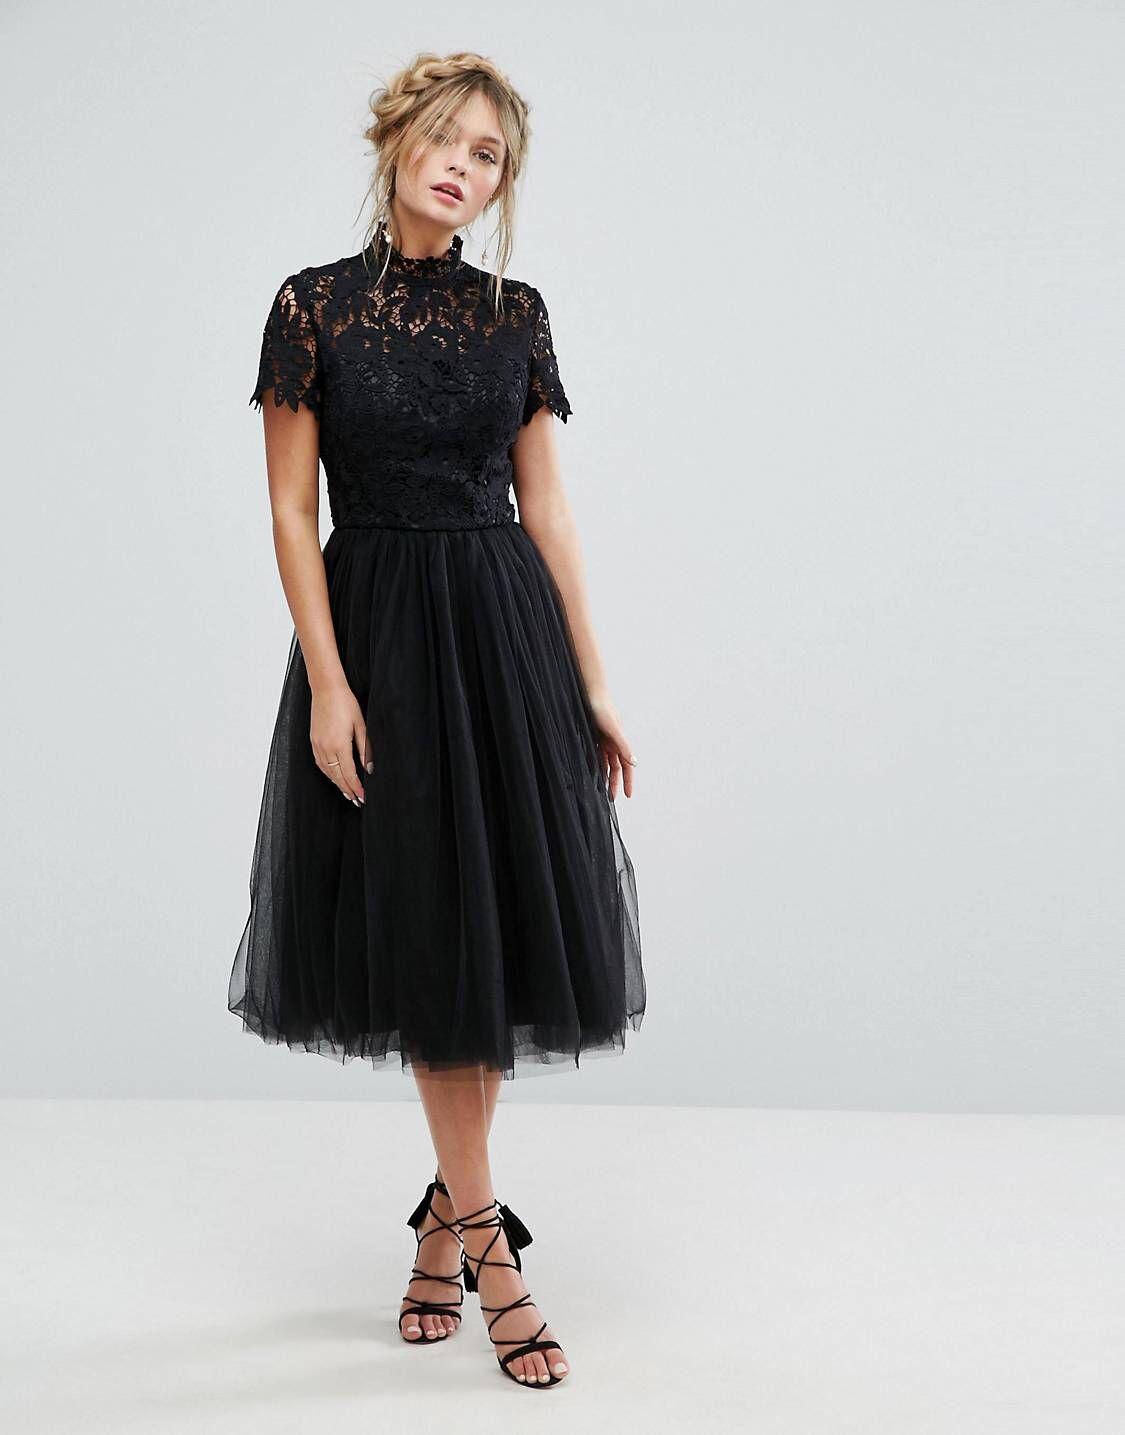 Chi Chi London High Neck Lace Midi Dress With Tulle Skirt In Black Asos Asos Black Chi Dress High Lace London In 2020 Kleid Mit Tullrock Midikleider Kleider